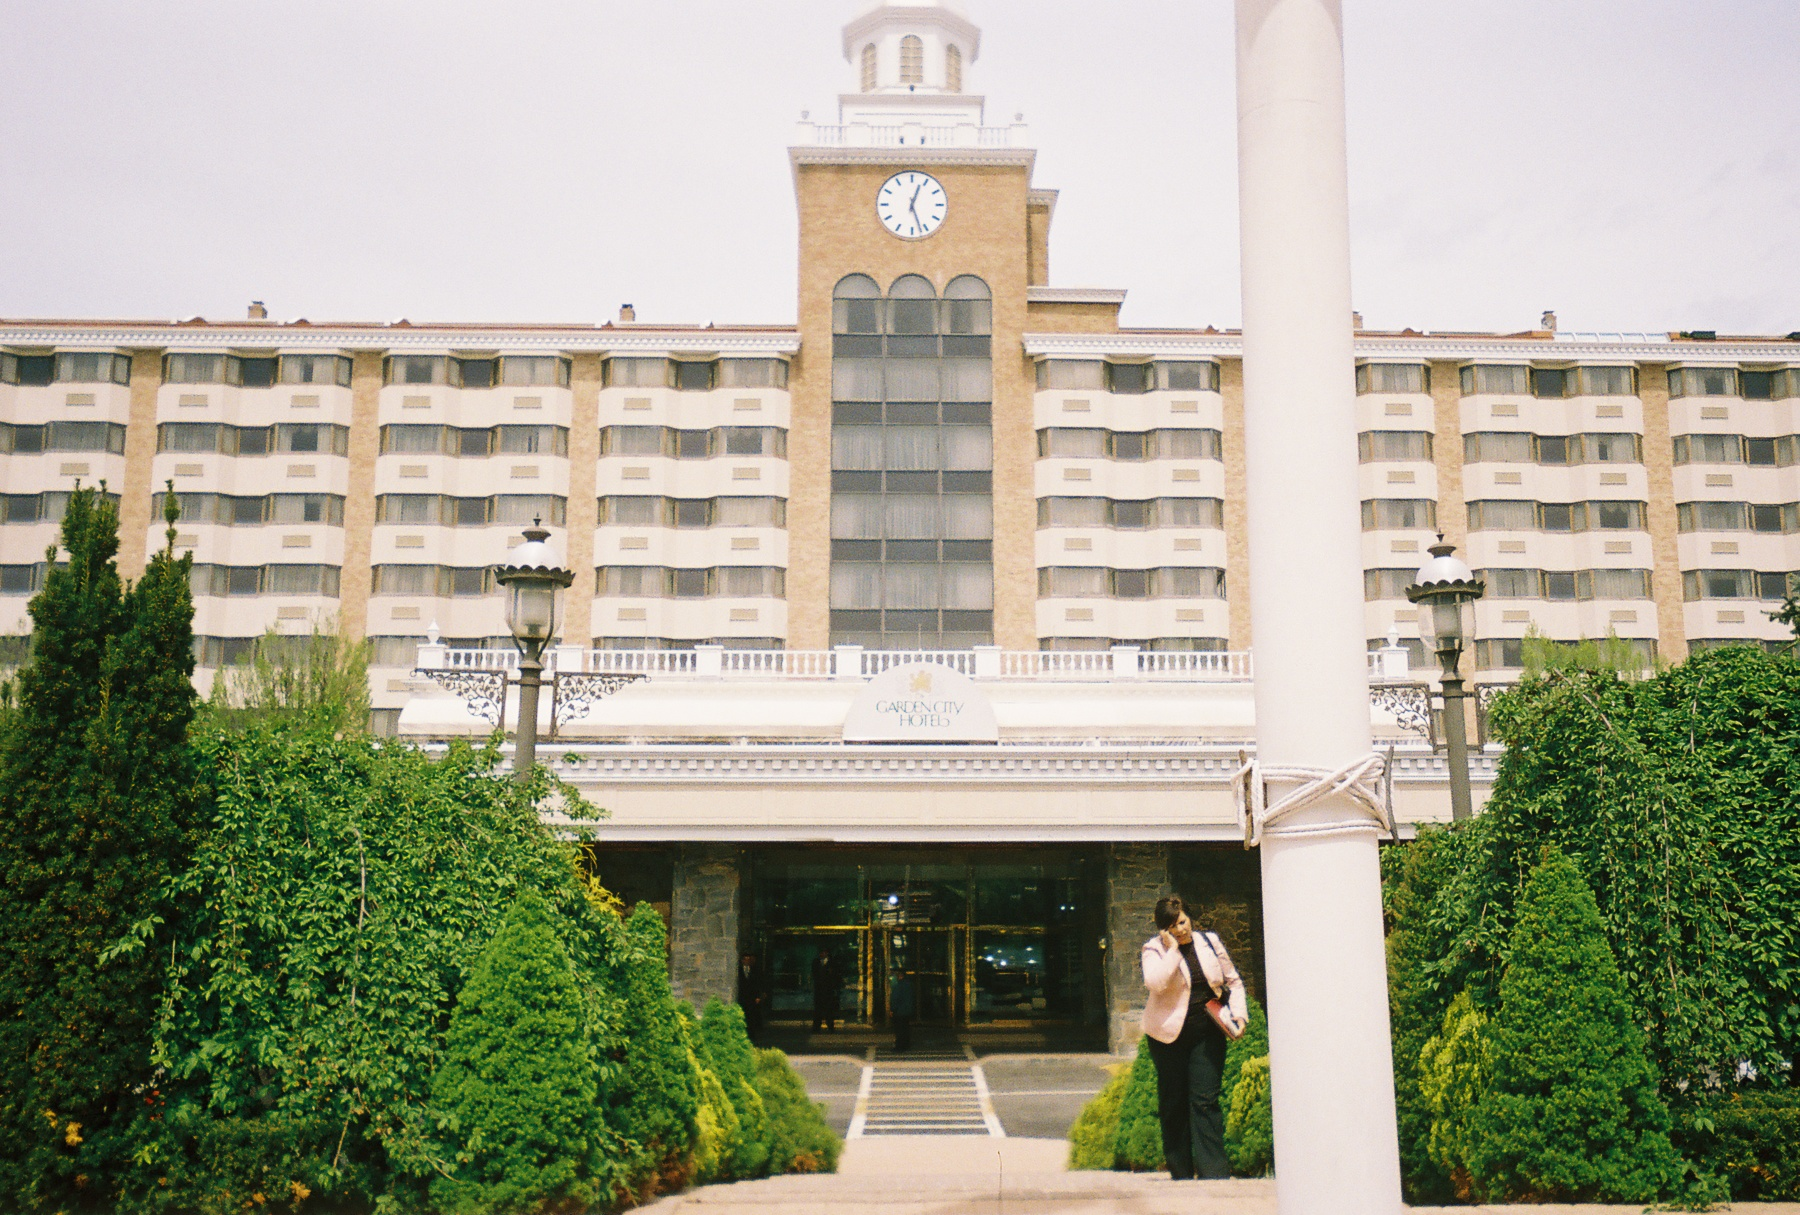 Garden city hotel tripadvisor